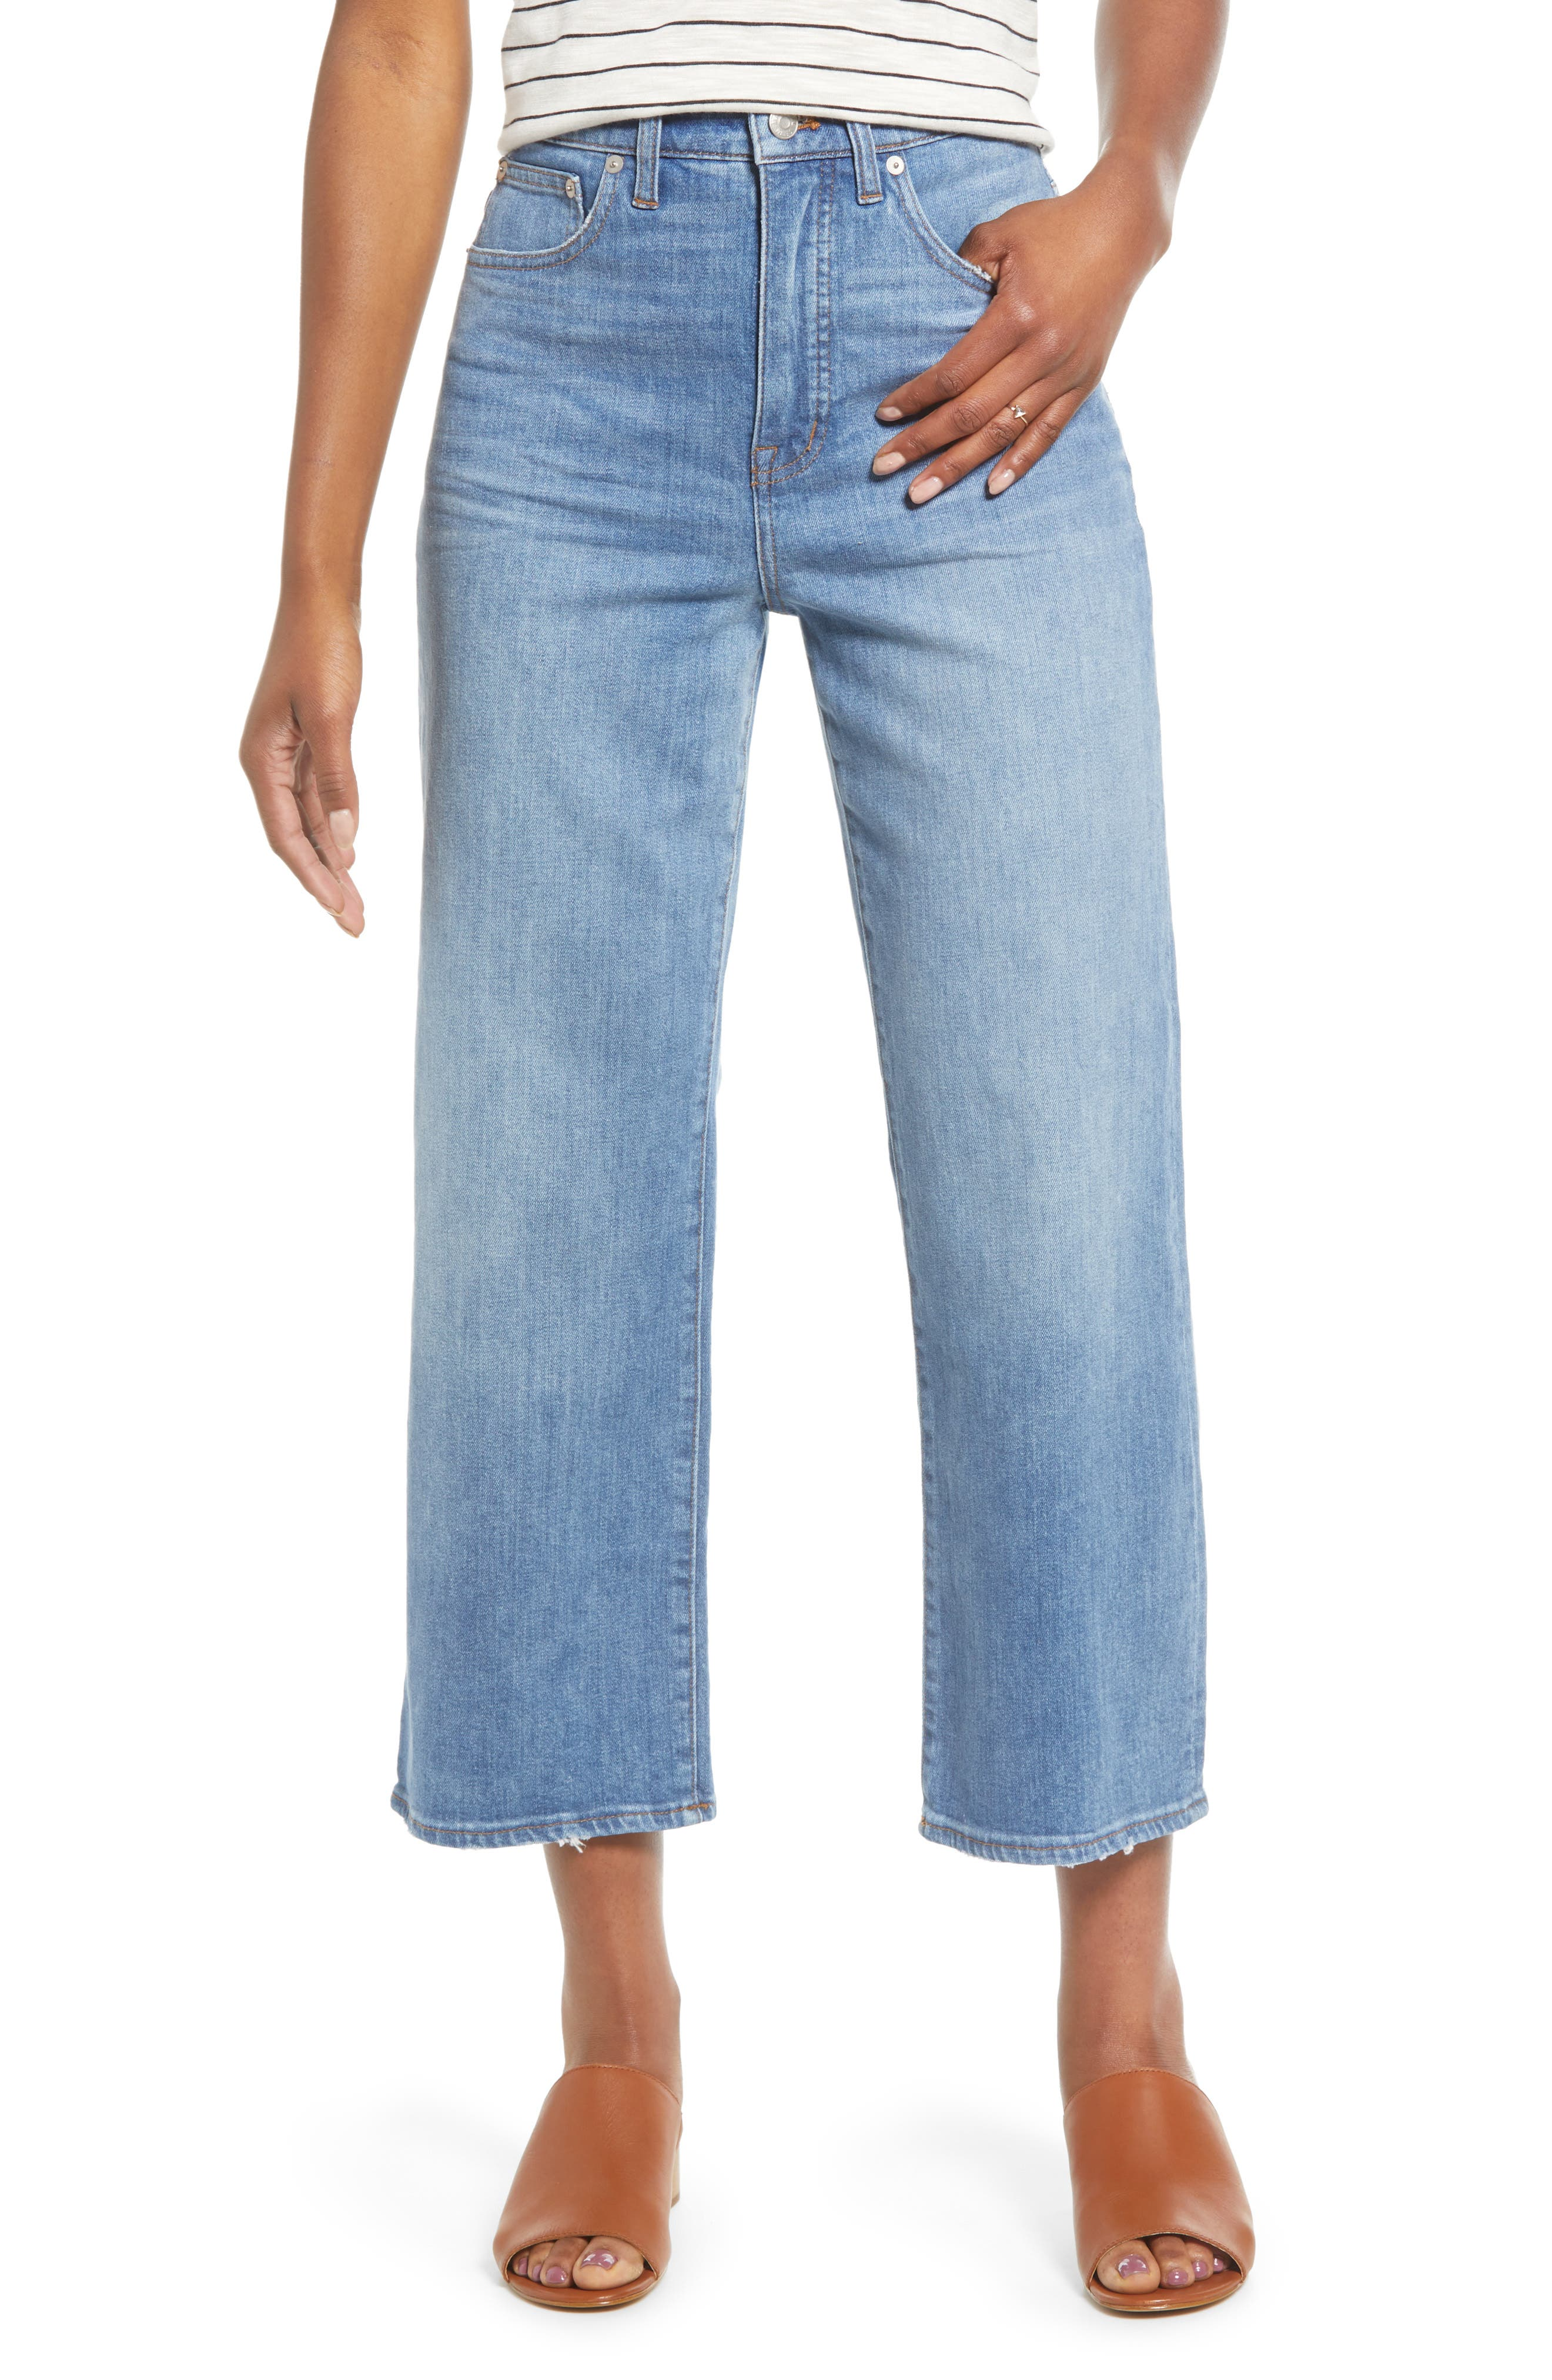 Madewell Slim Wide Leg Jeans (Garrett) (Regular & Plus Size)